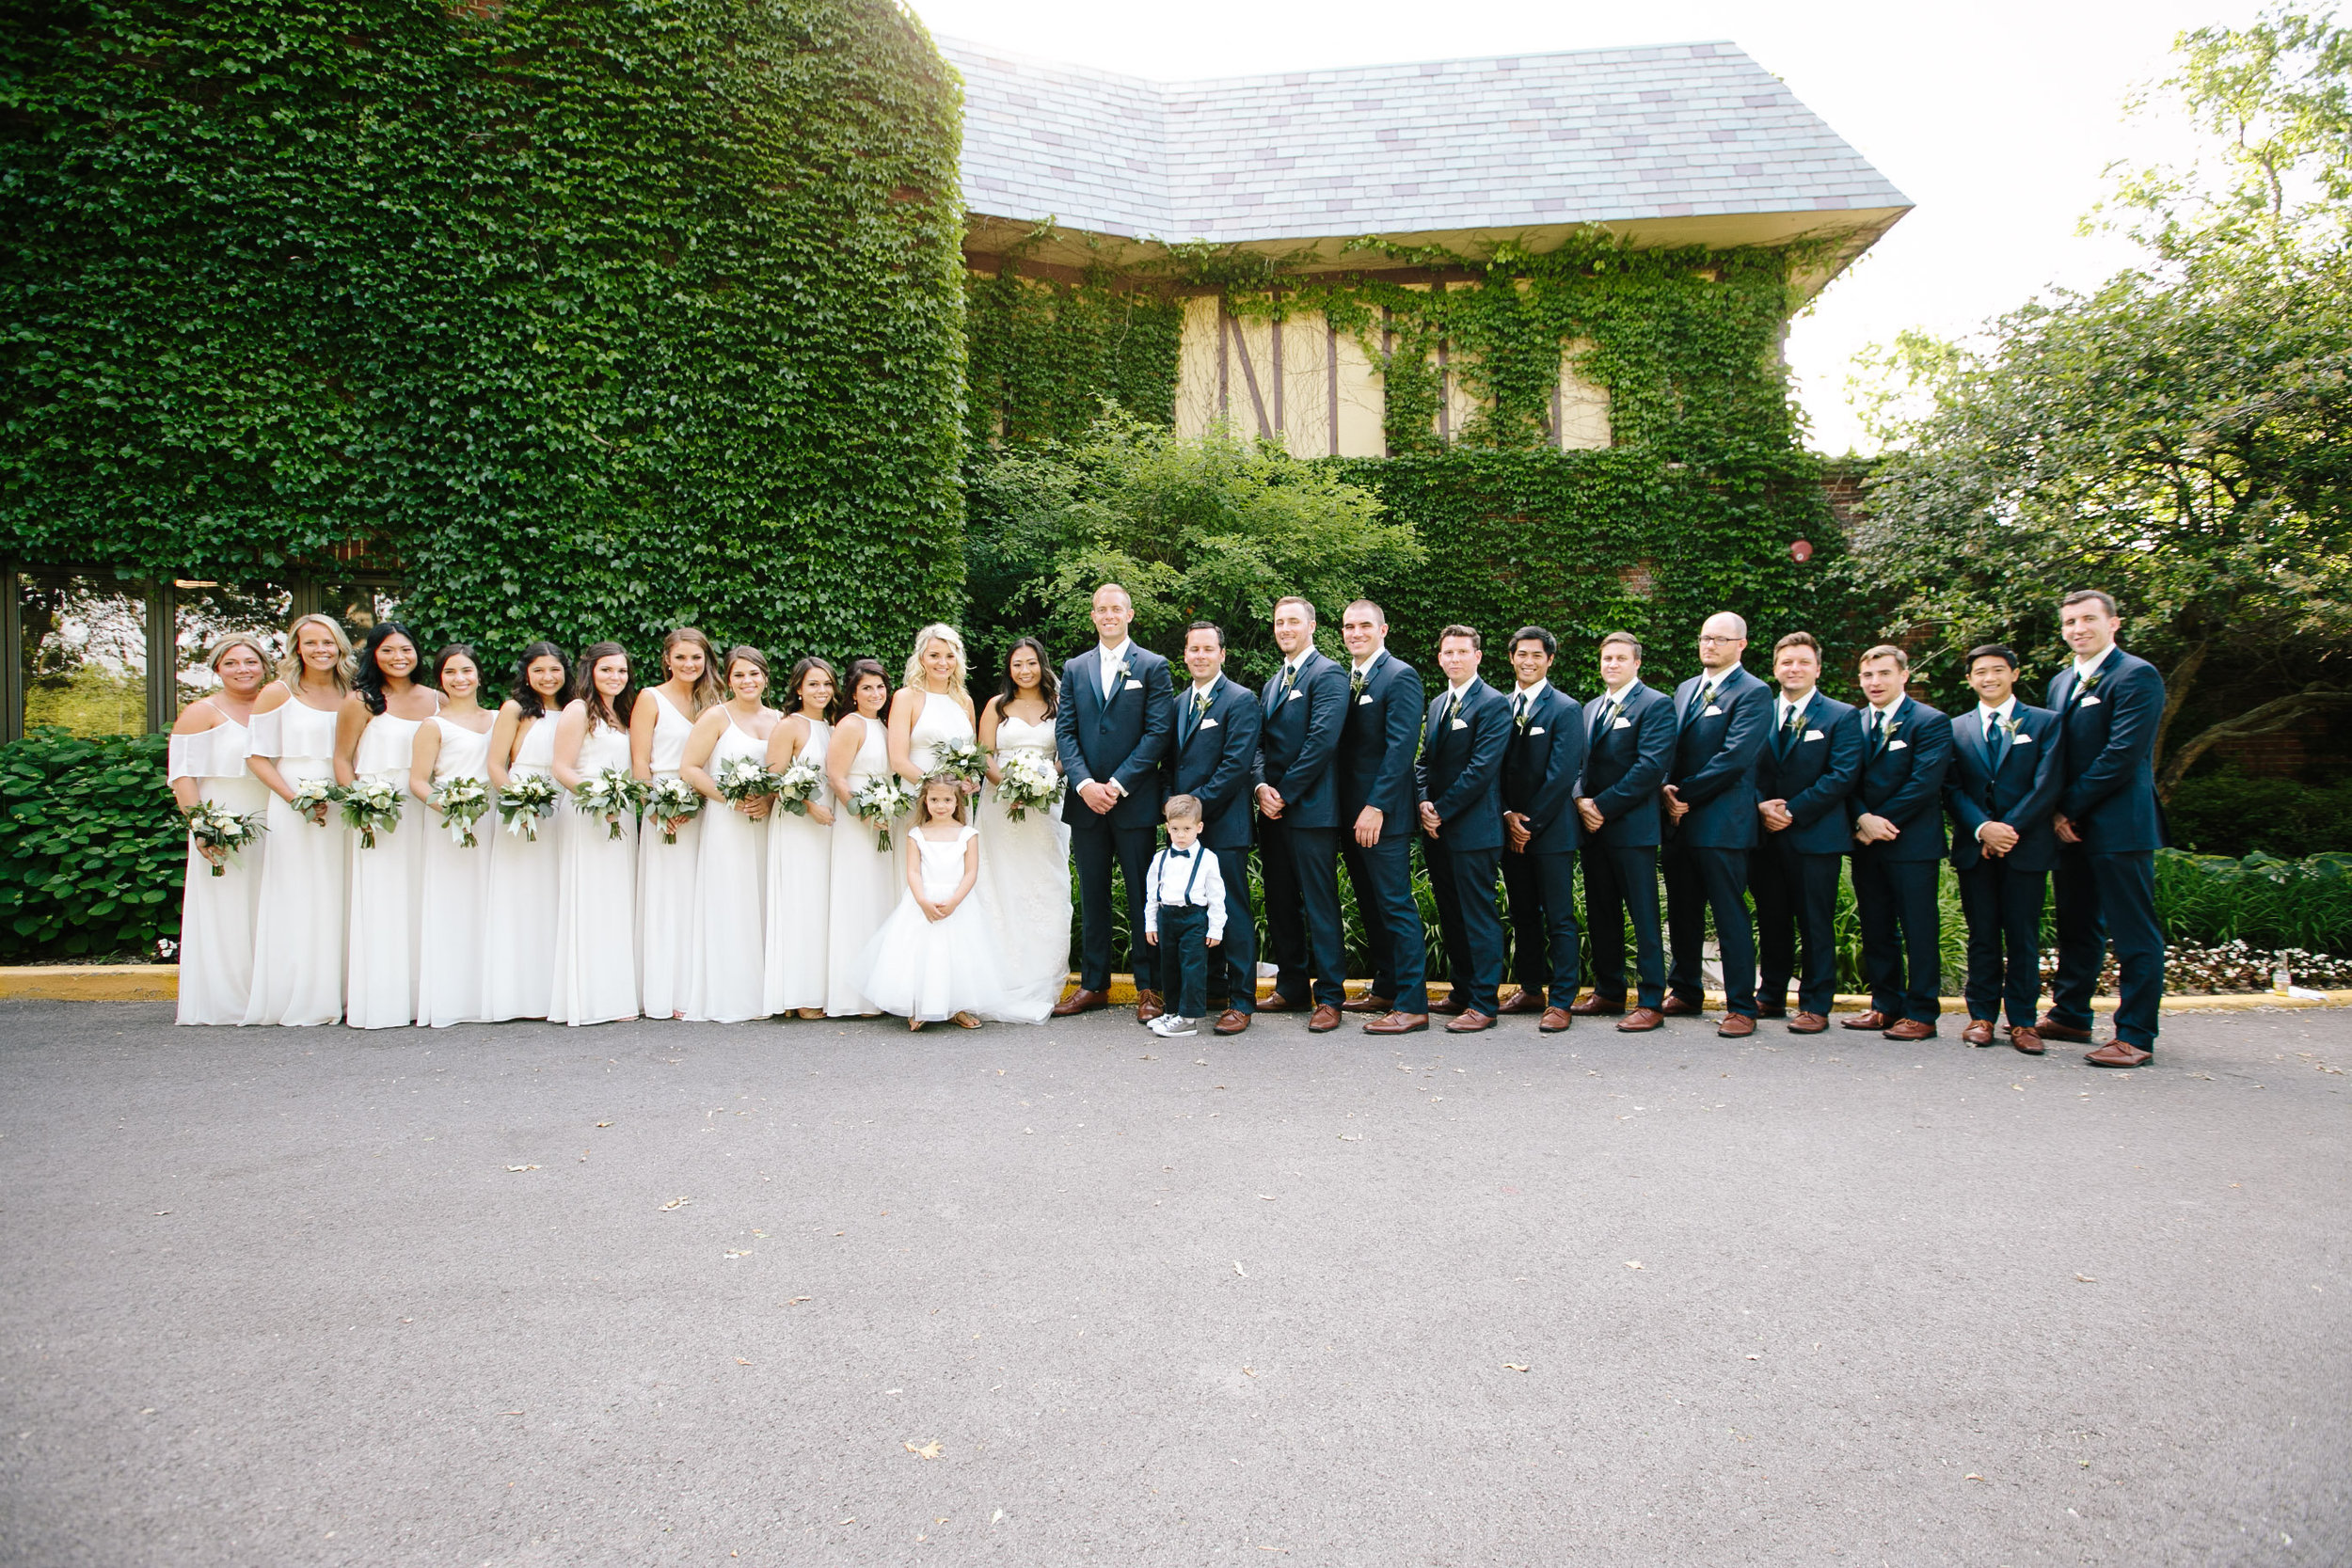 07 - Bridal Party-0604.jpg